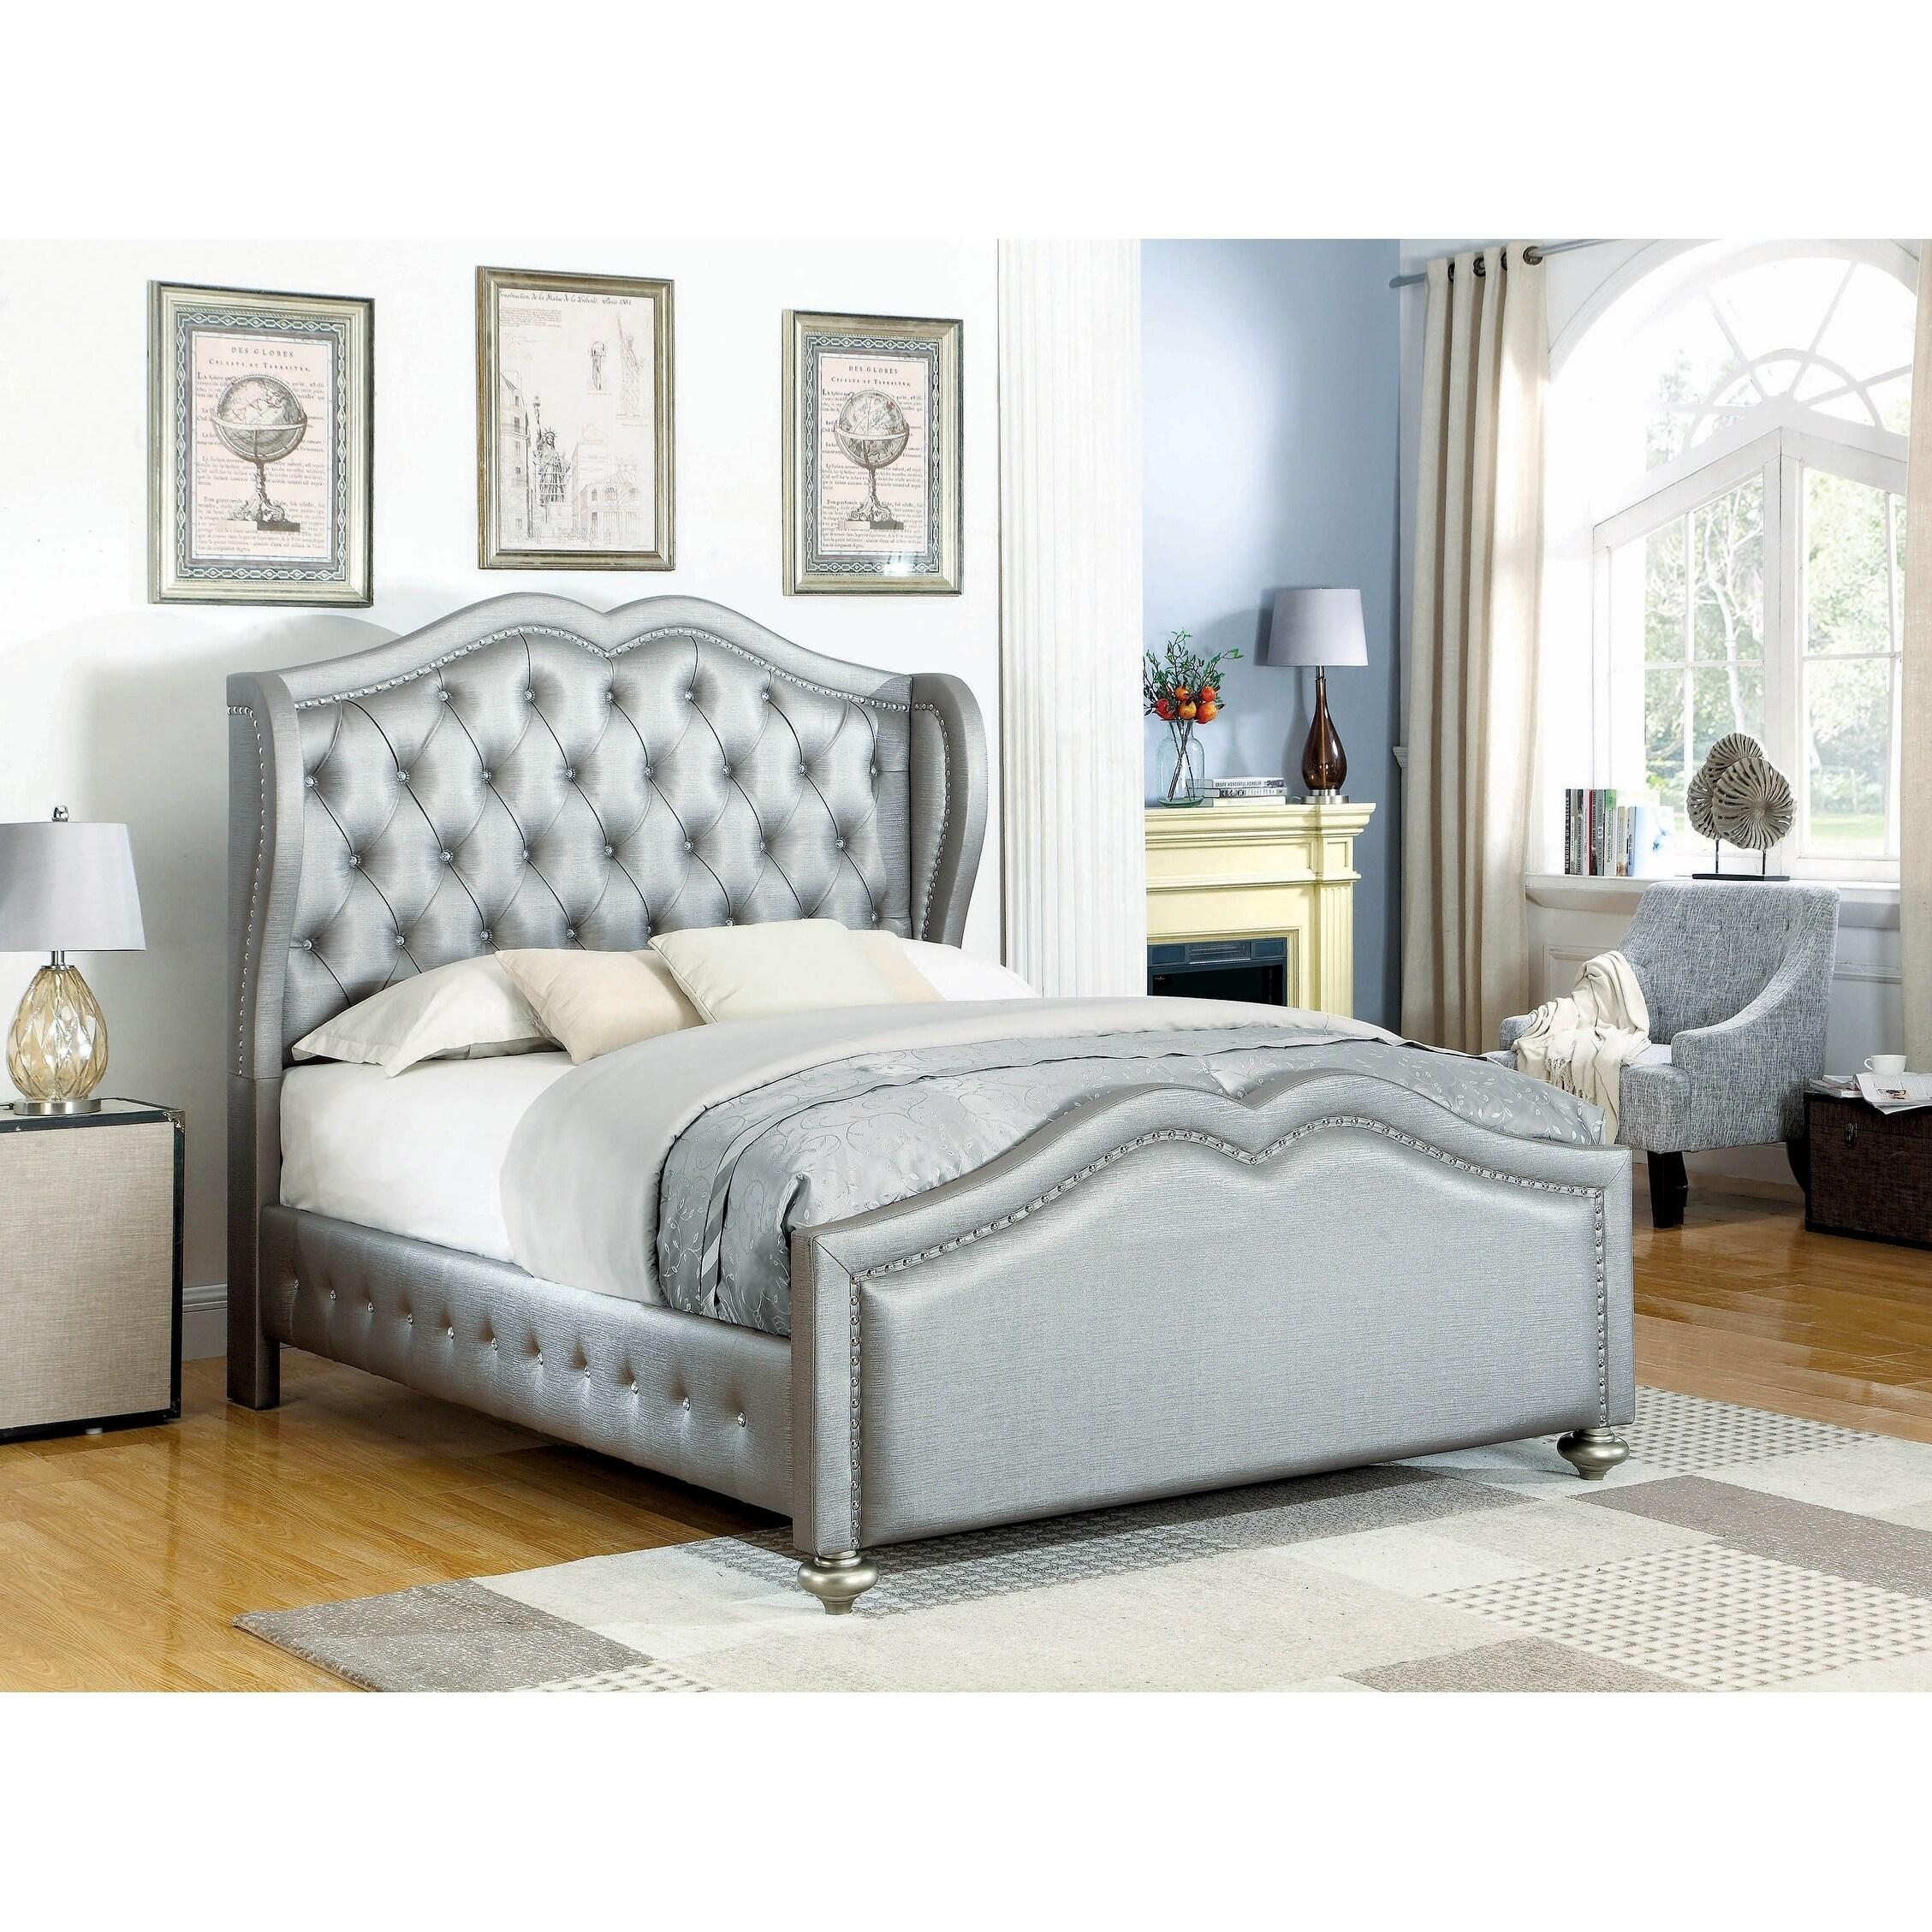 Isabella Metallic Platinum 2 Piece Panel Bedroom Set With Chest